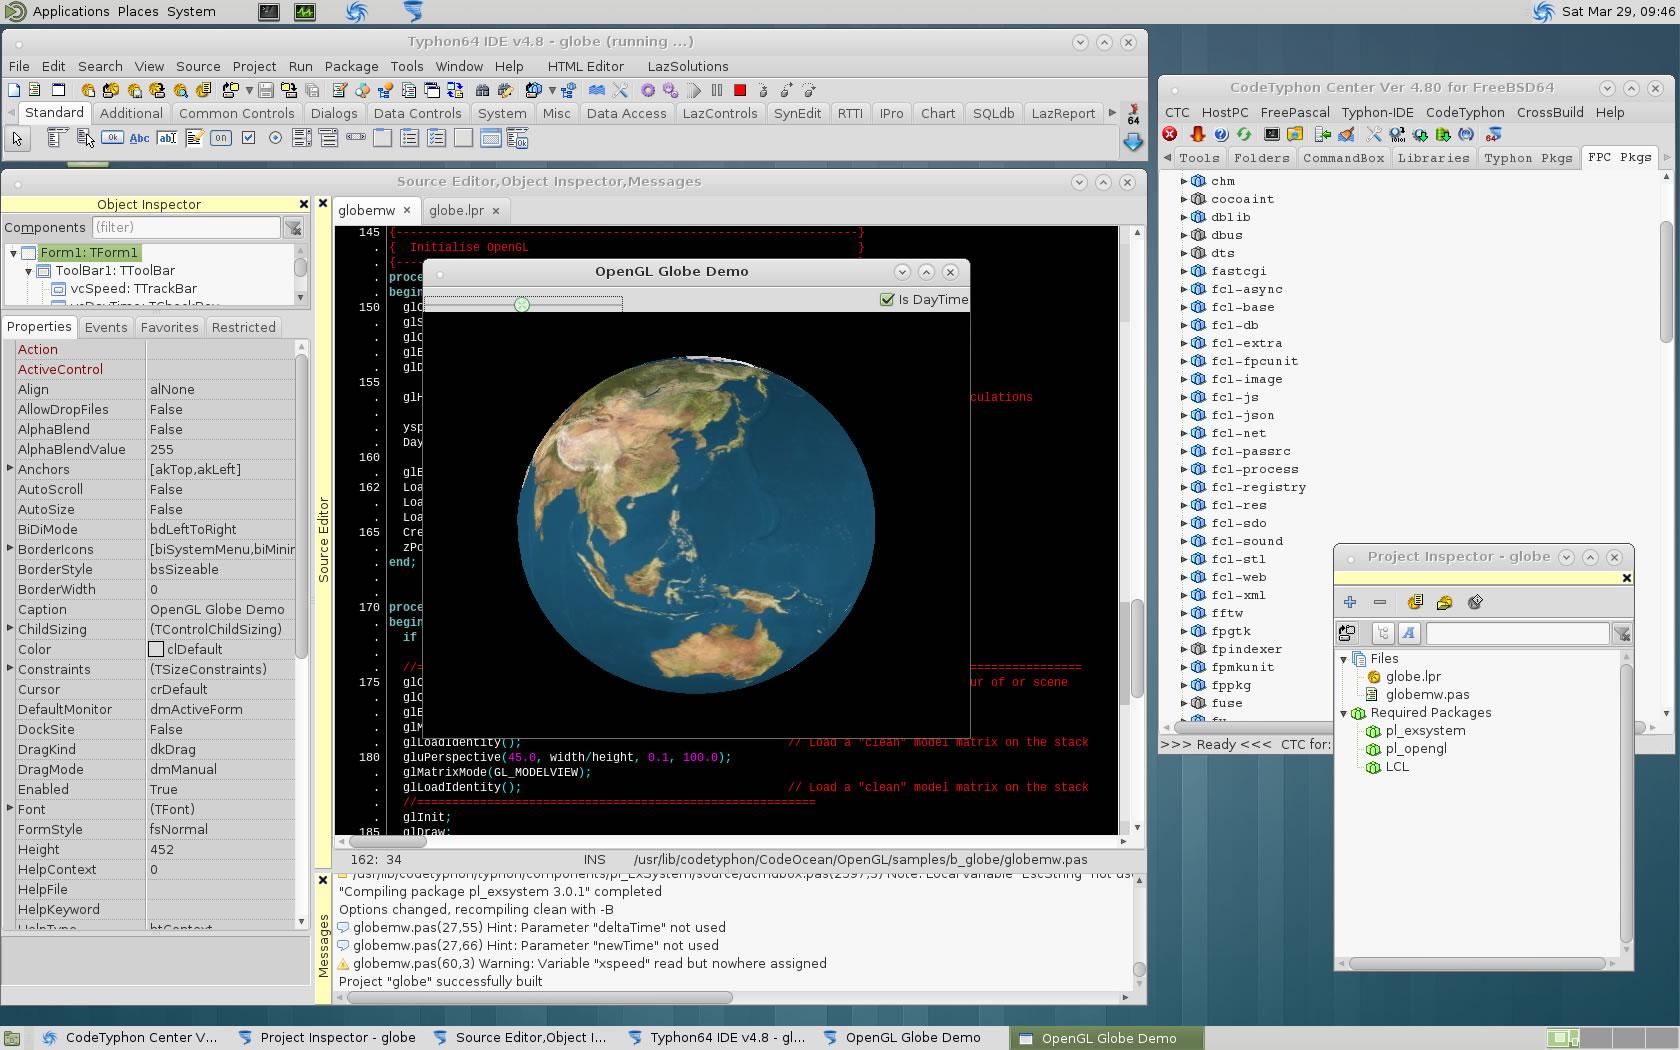 FreeBSD10-64-26.jpg